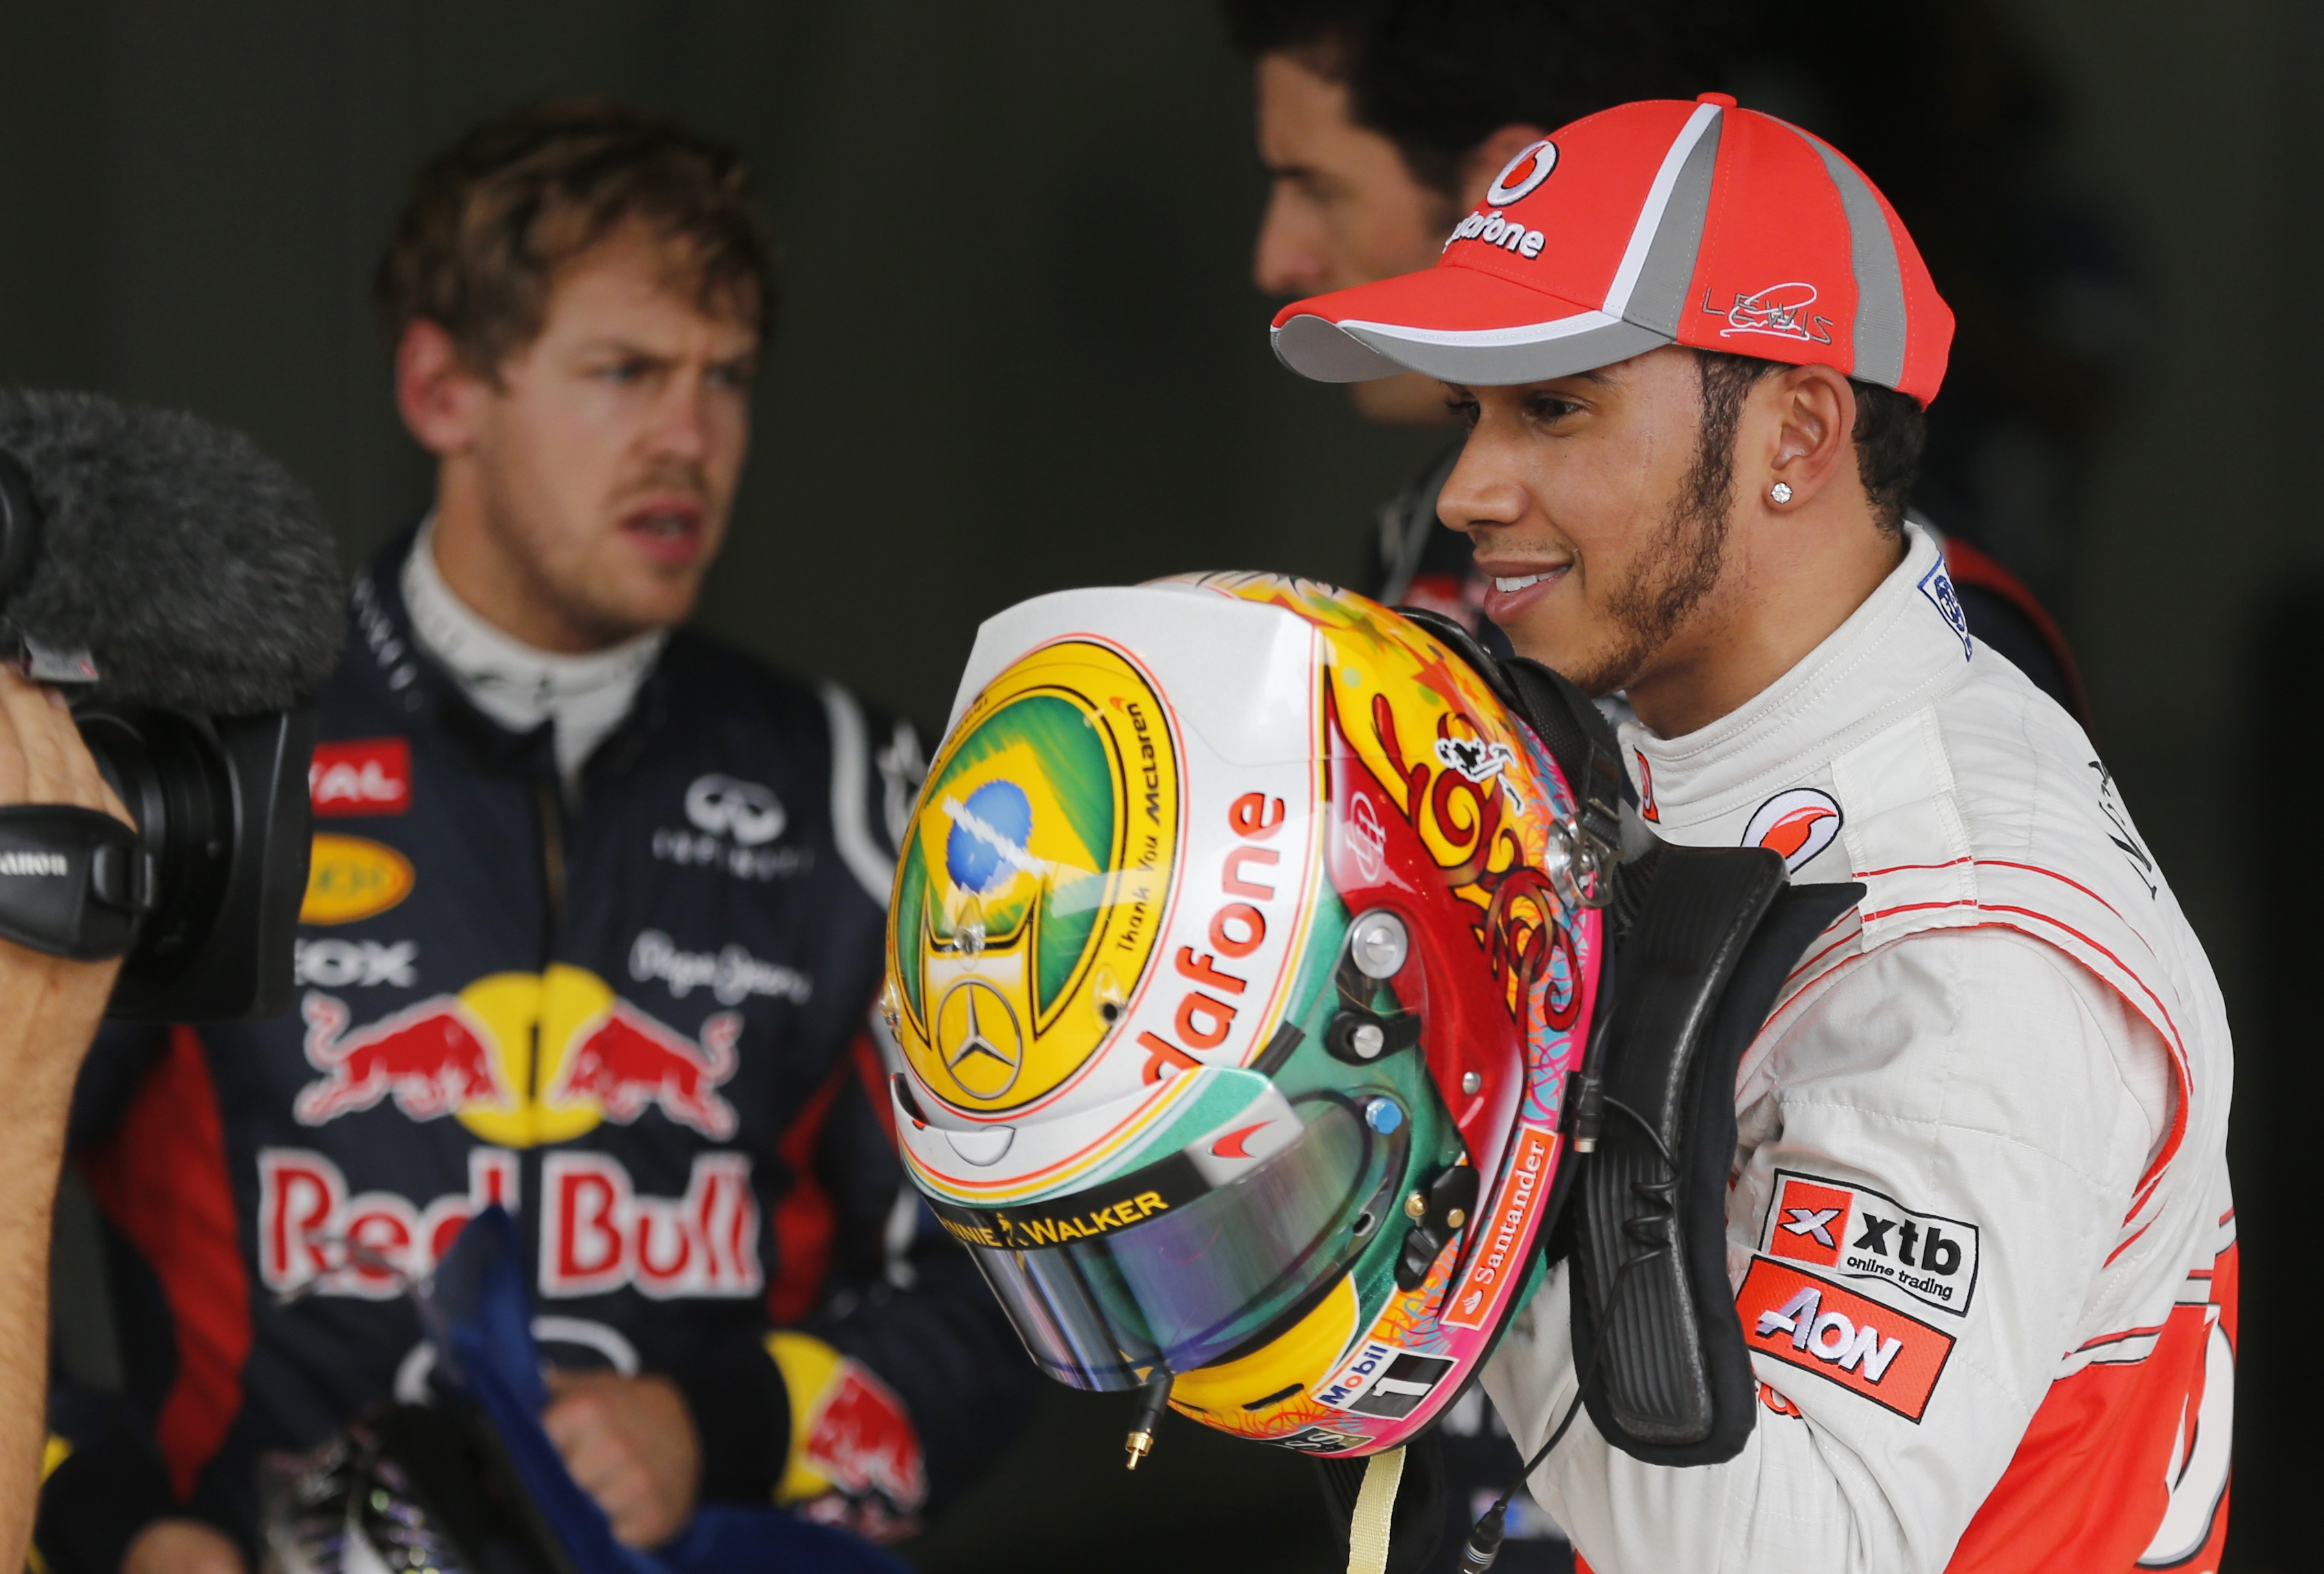 Fastest qualifier Lewis Hamilton shows off his Brazilian flag helmet on November 24, 2012